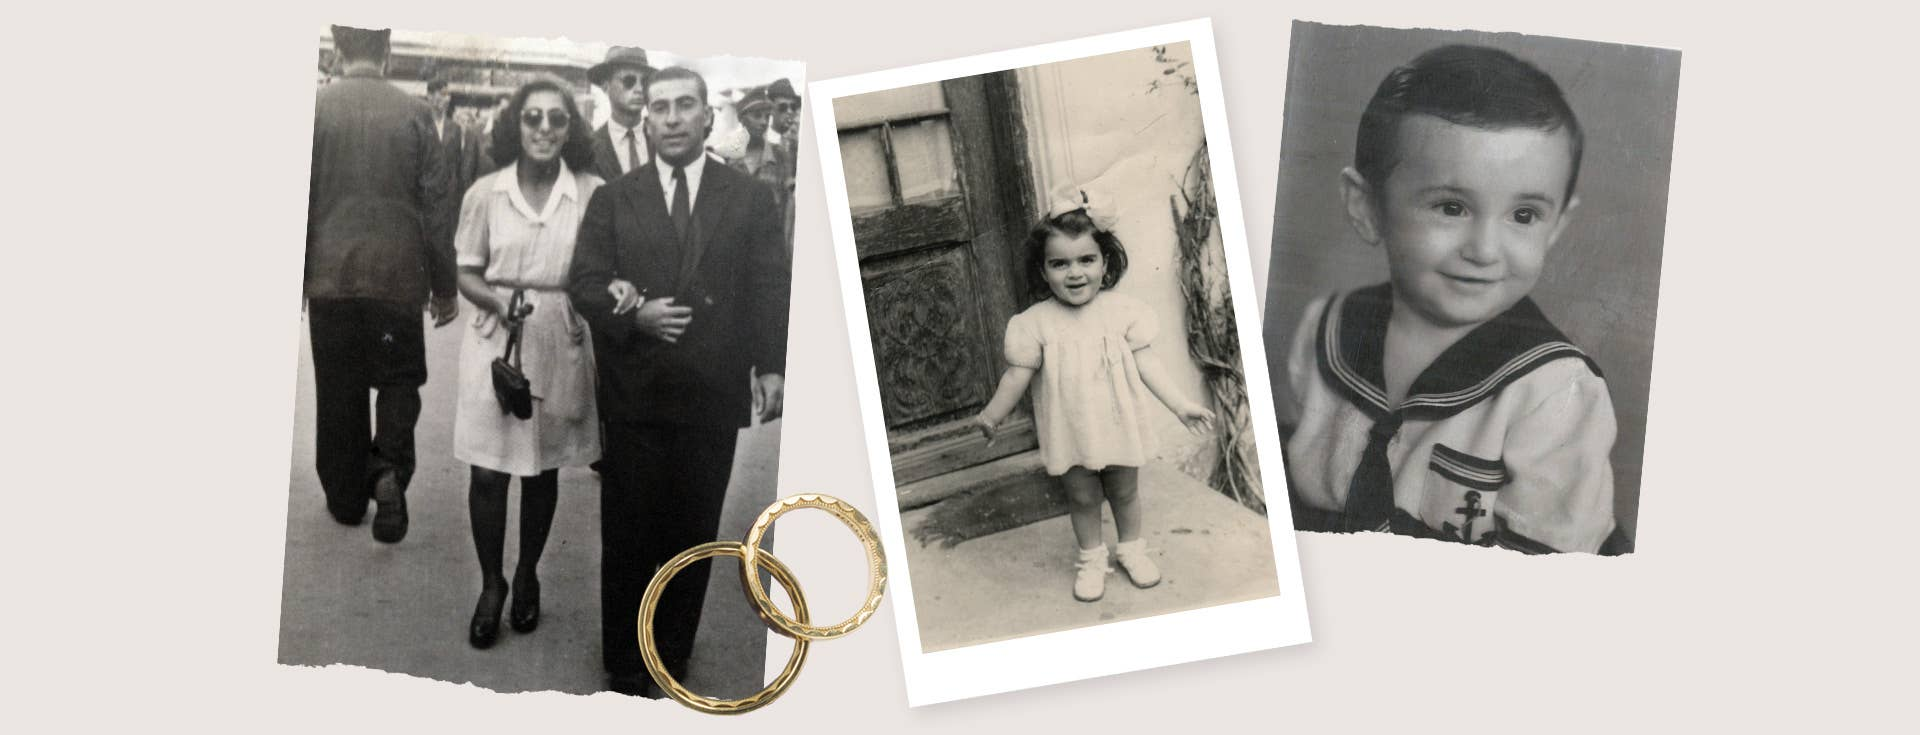 Tacorian Family Photos- Haig and Gilda